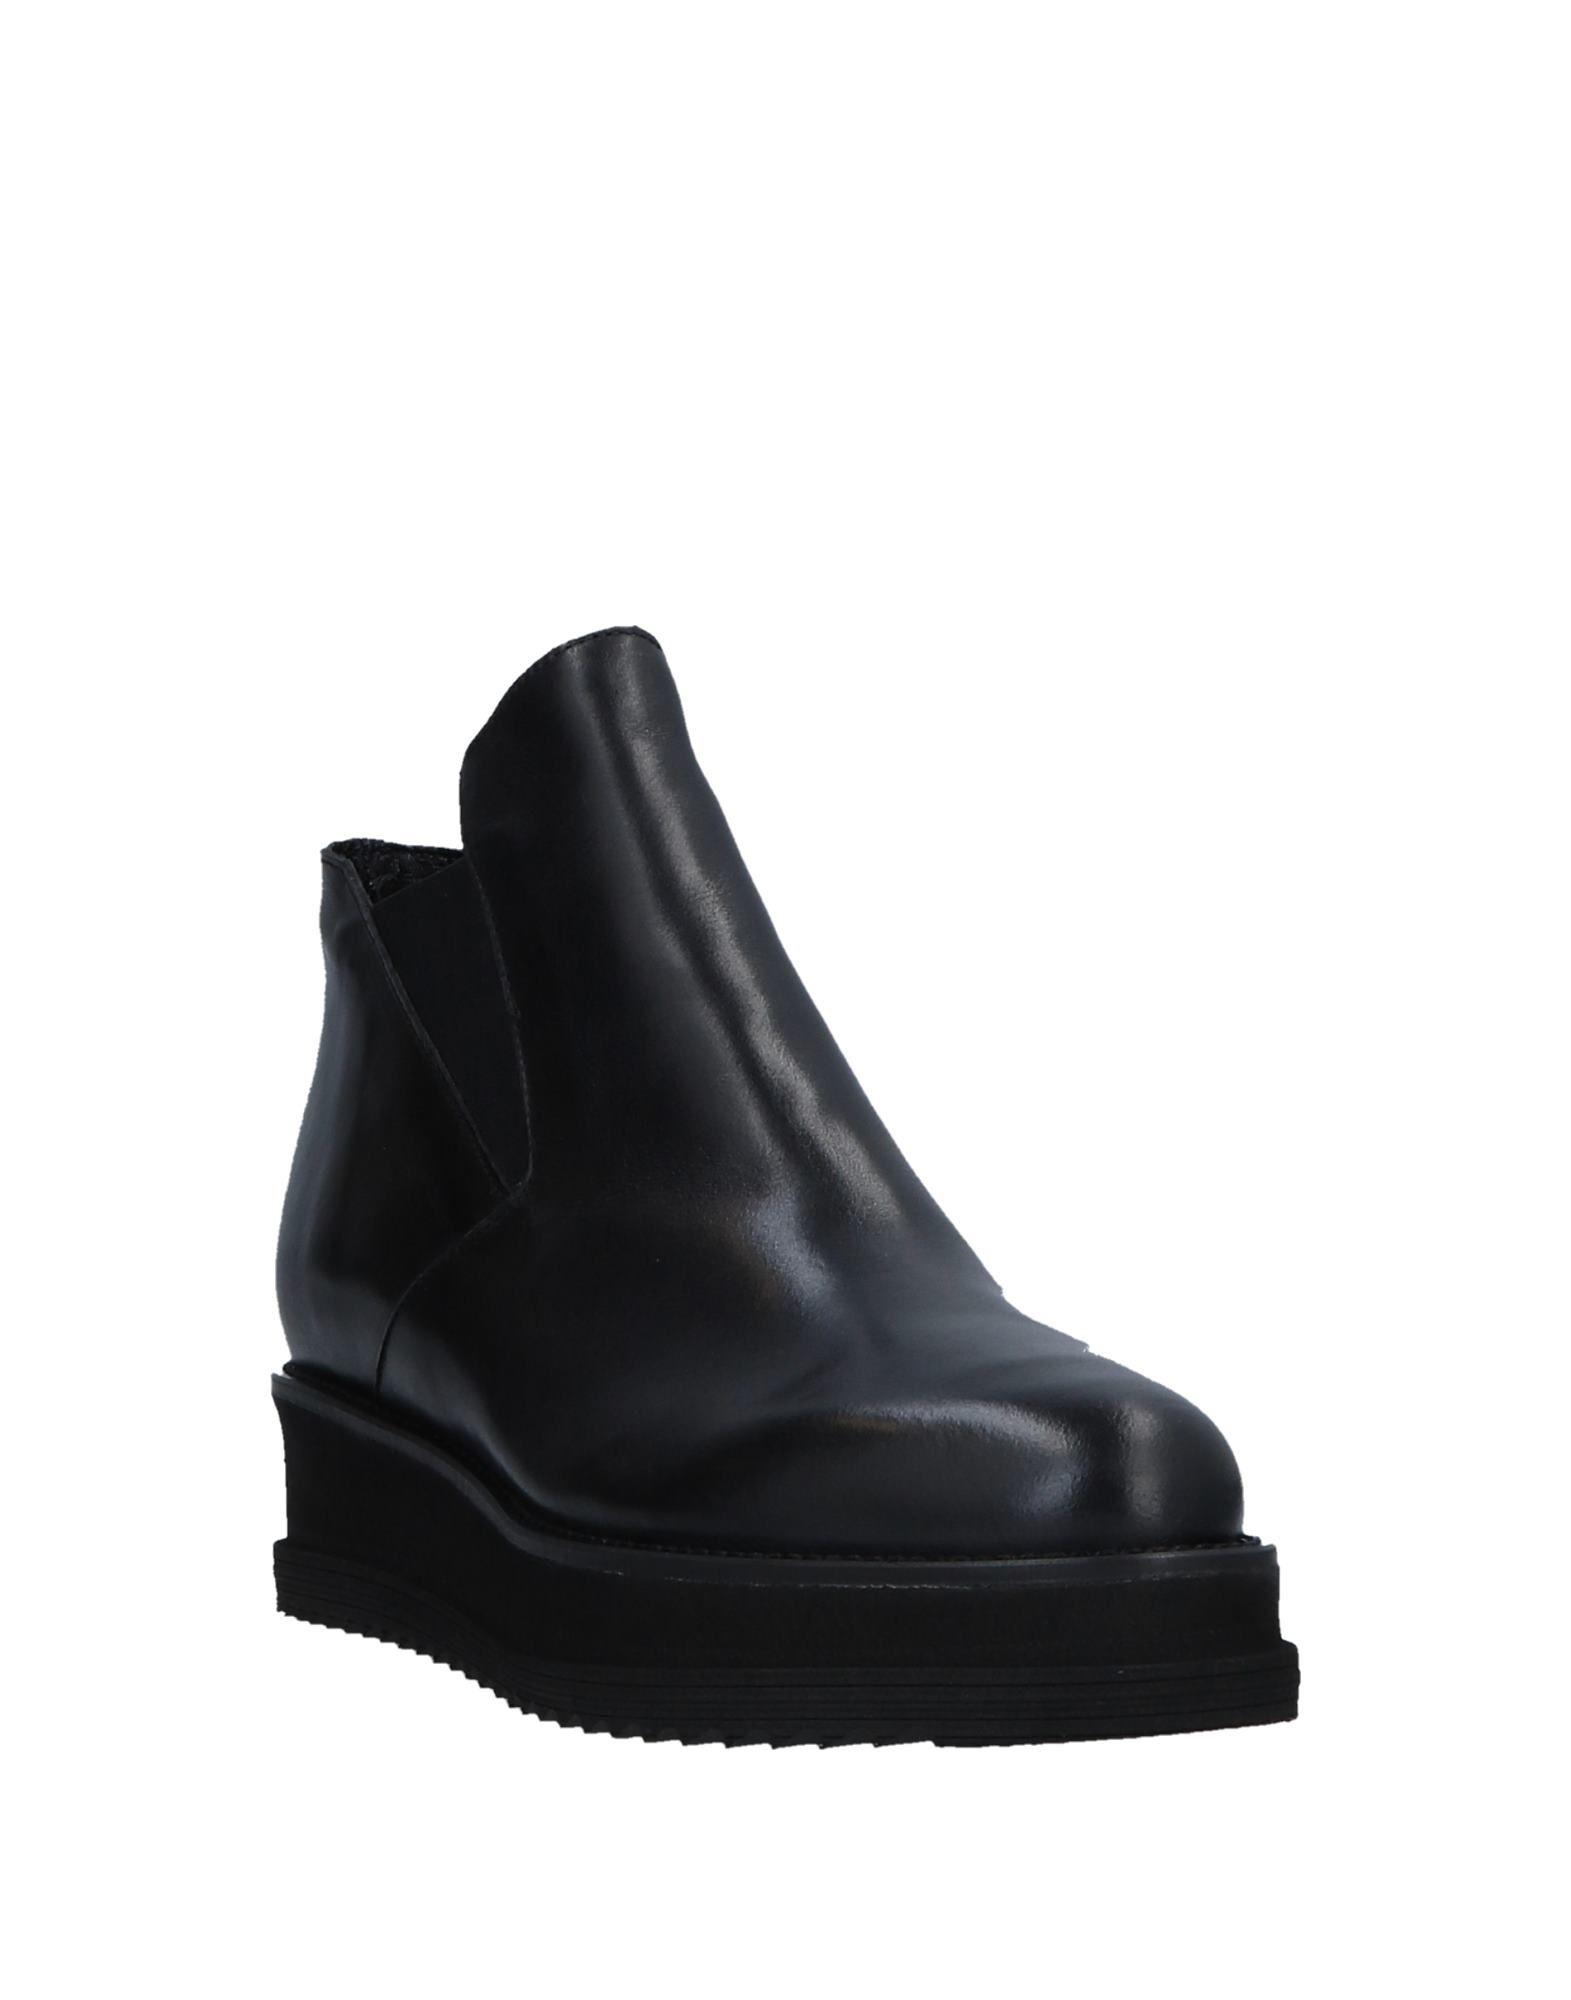 Stilvolle billige Schuhe Le Ble 11526469PJ Chelsea Boots Damen  11526469PJ Ble f4bb3e